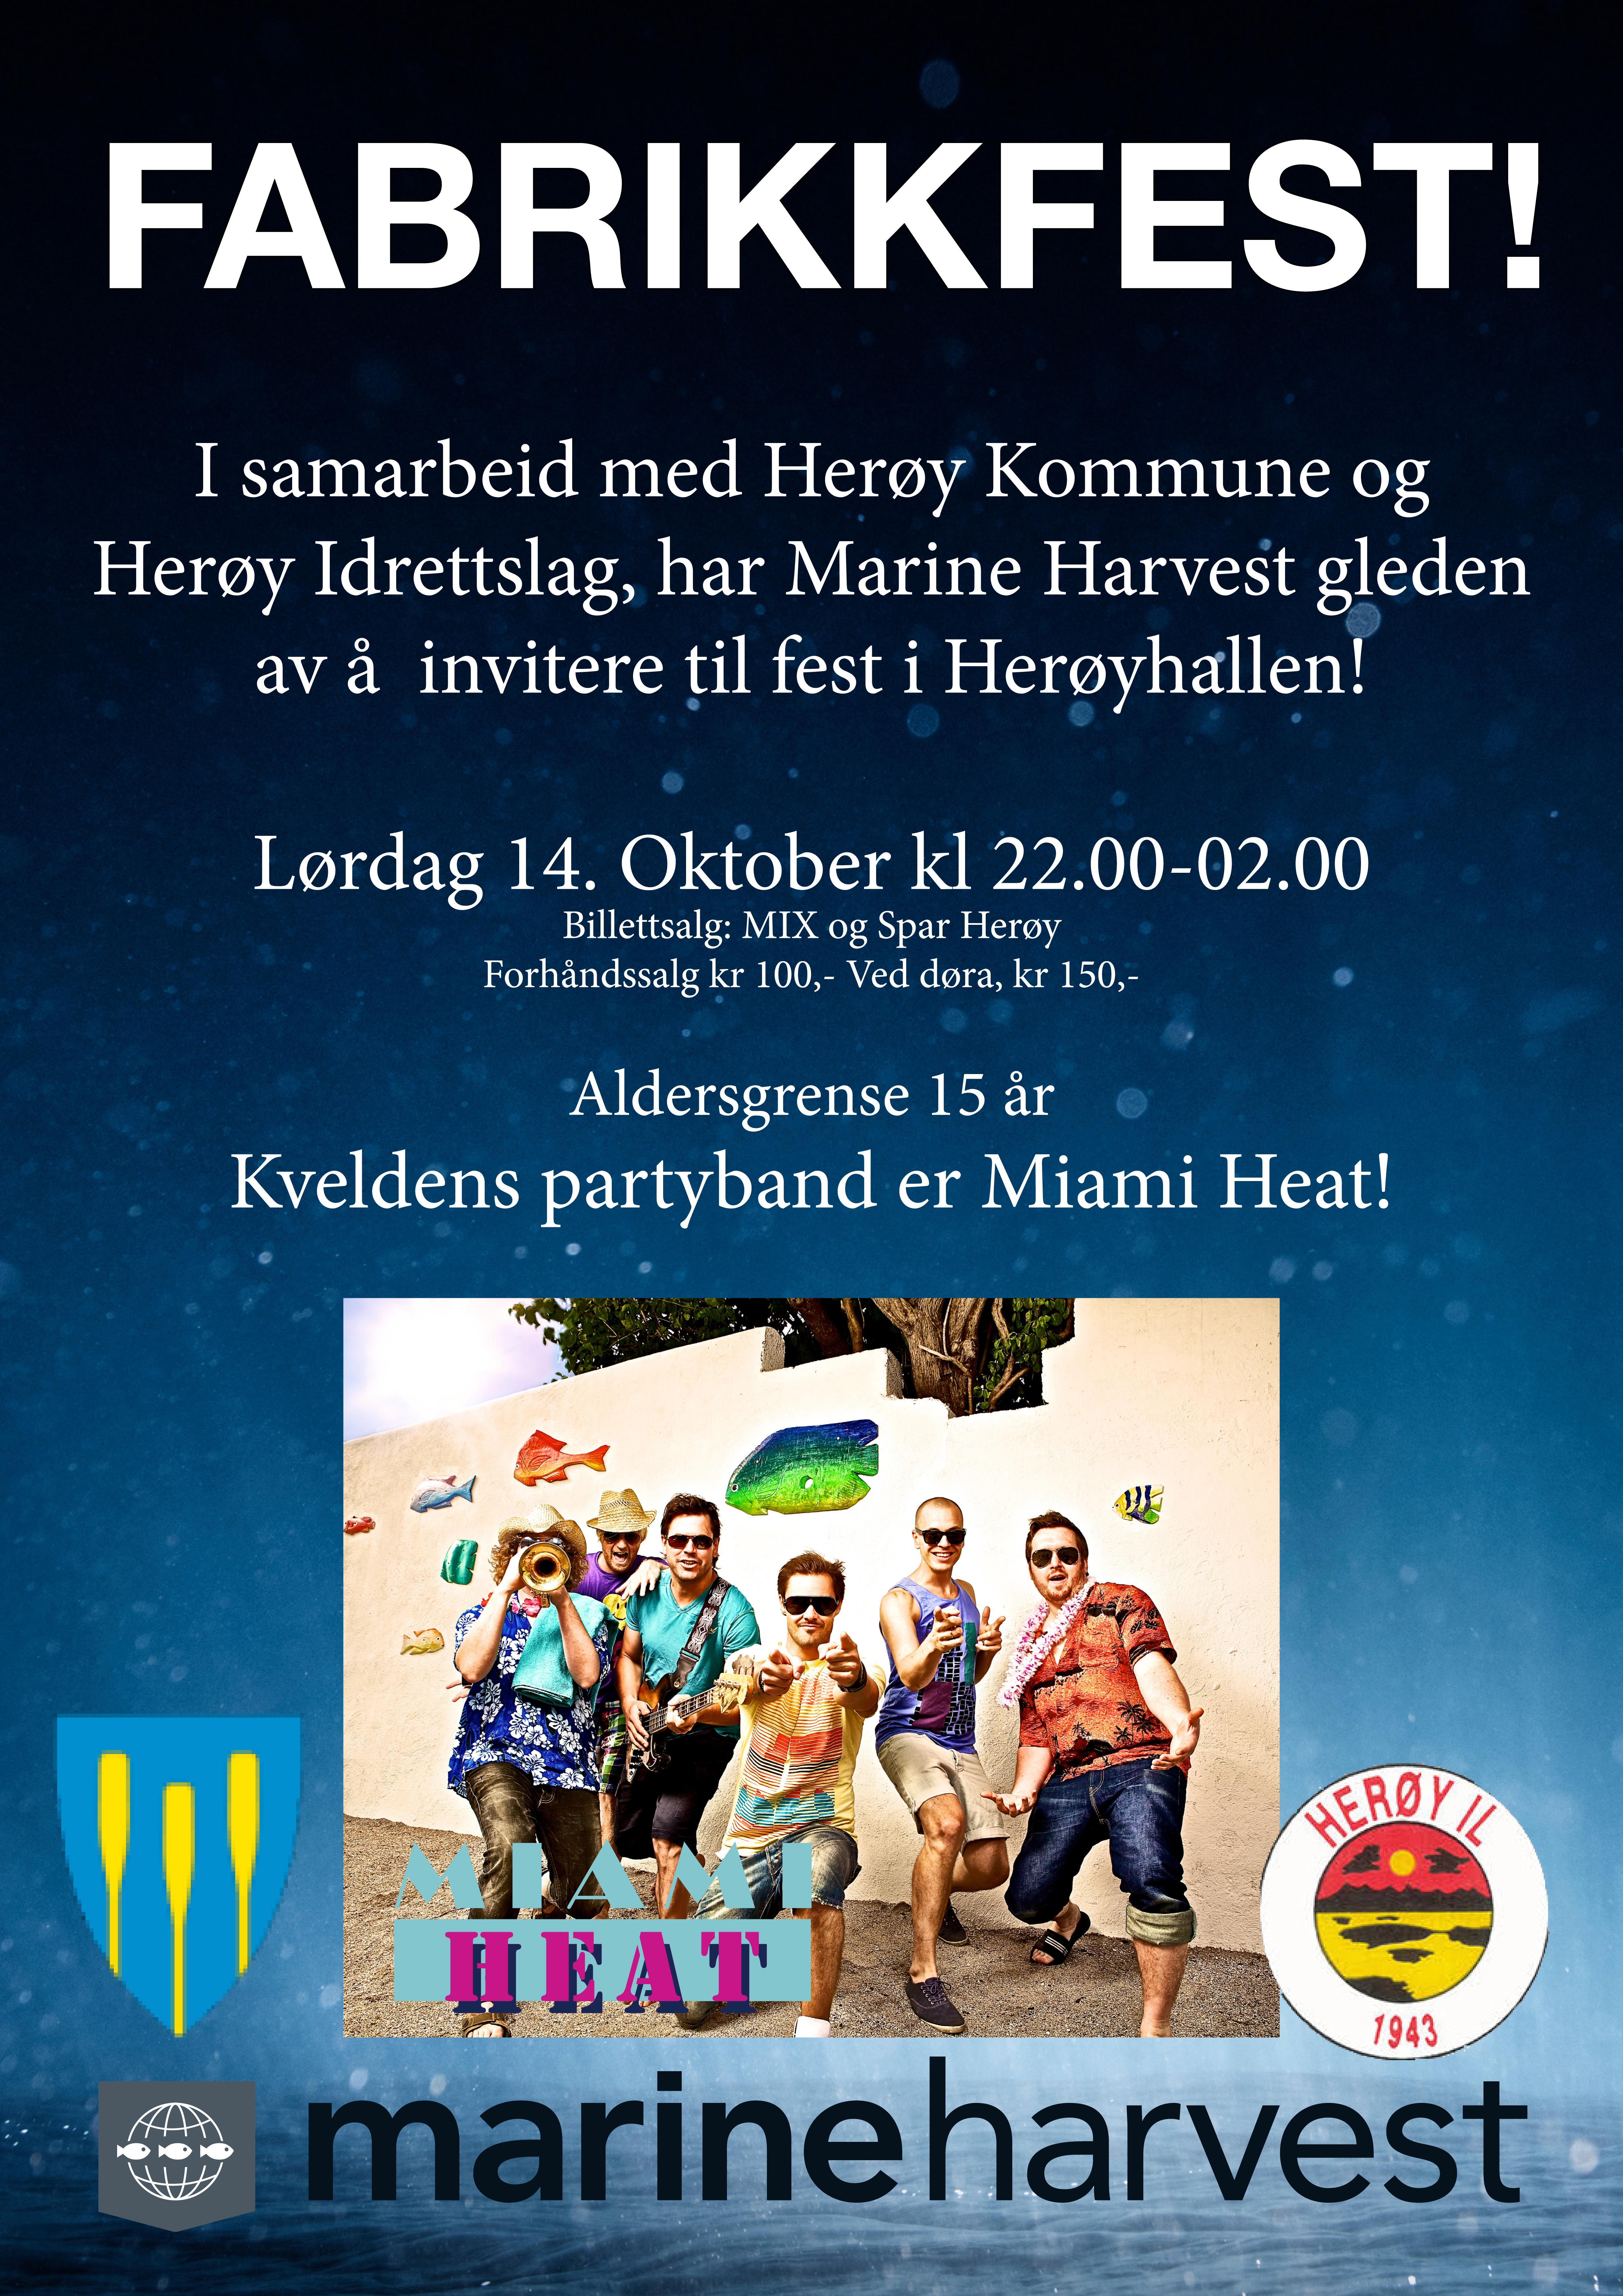 Fabrikkfest i Herøyhallen_plakat.jpg